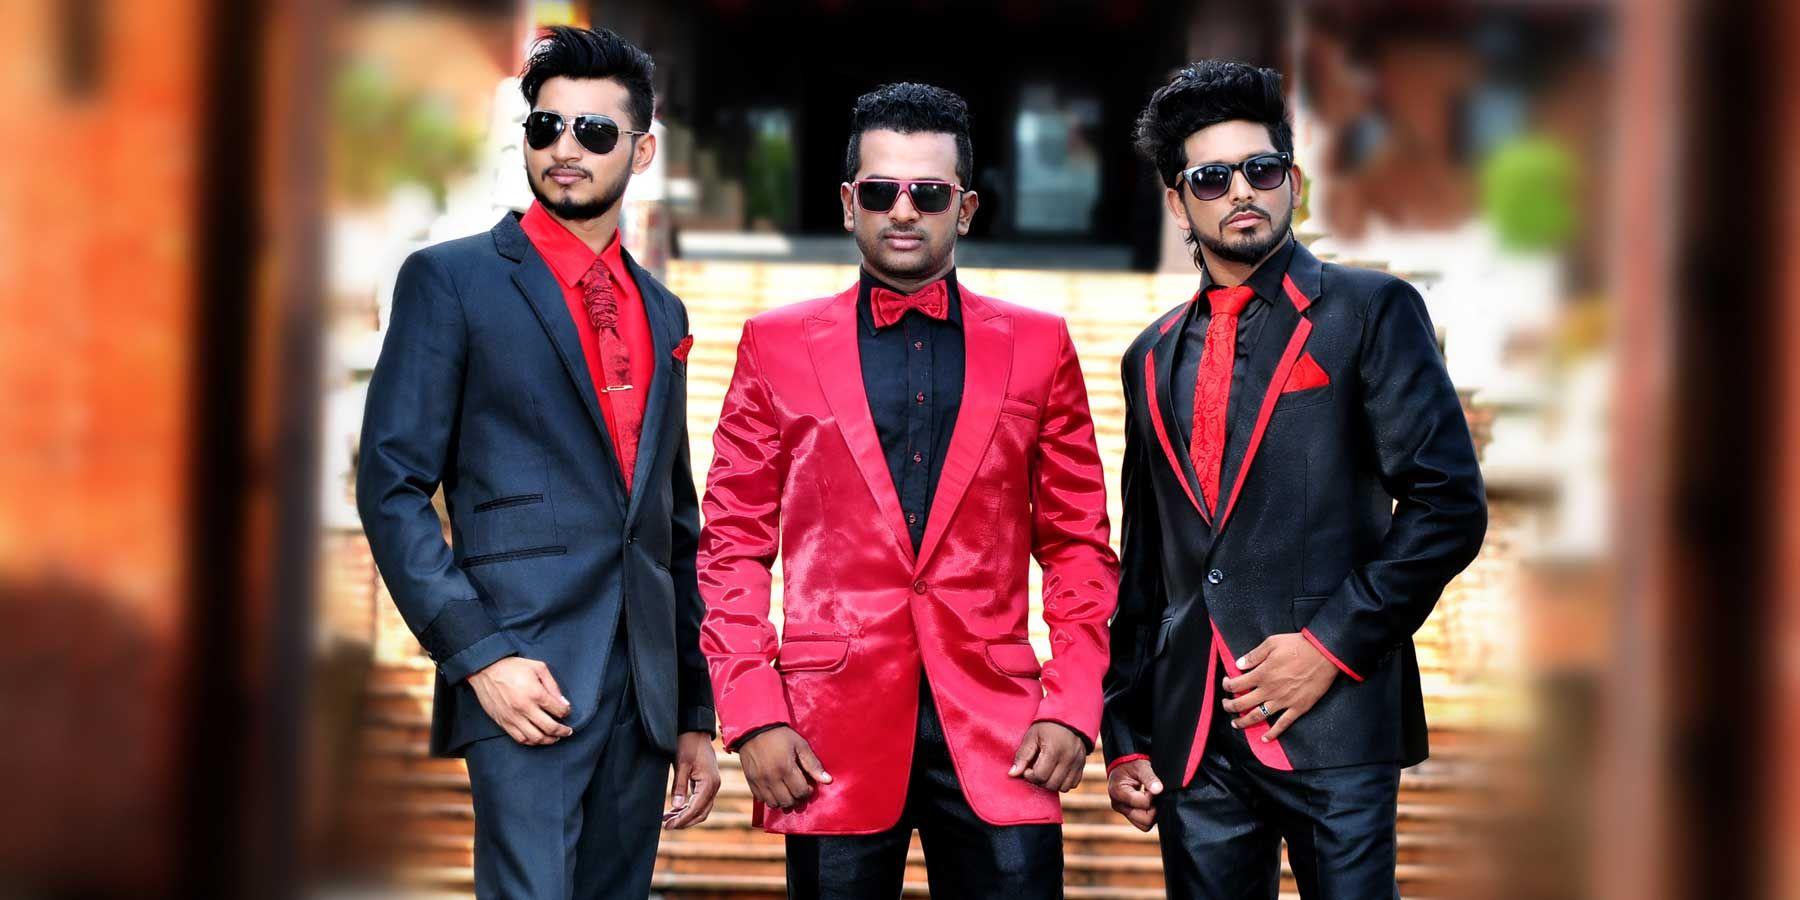 sri lankan groom wedding suits Google Search Wedding